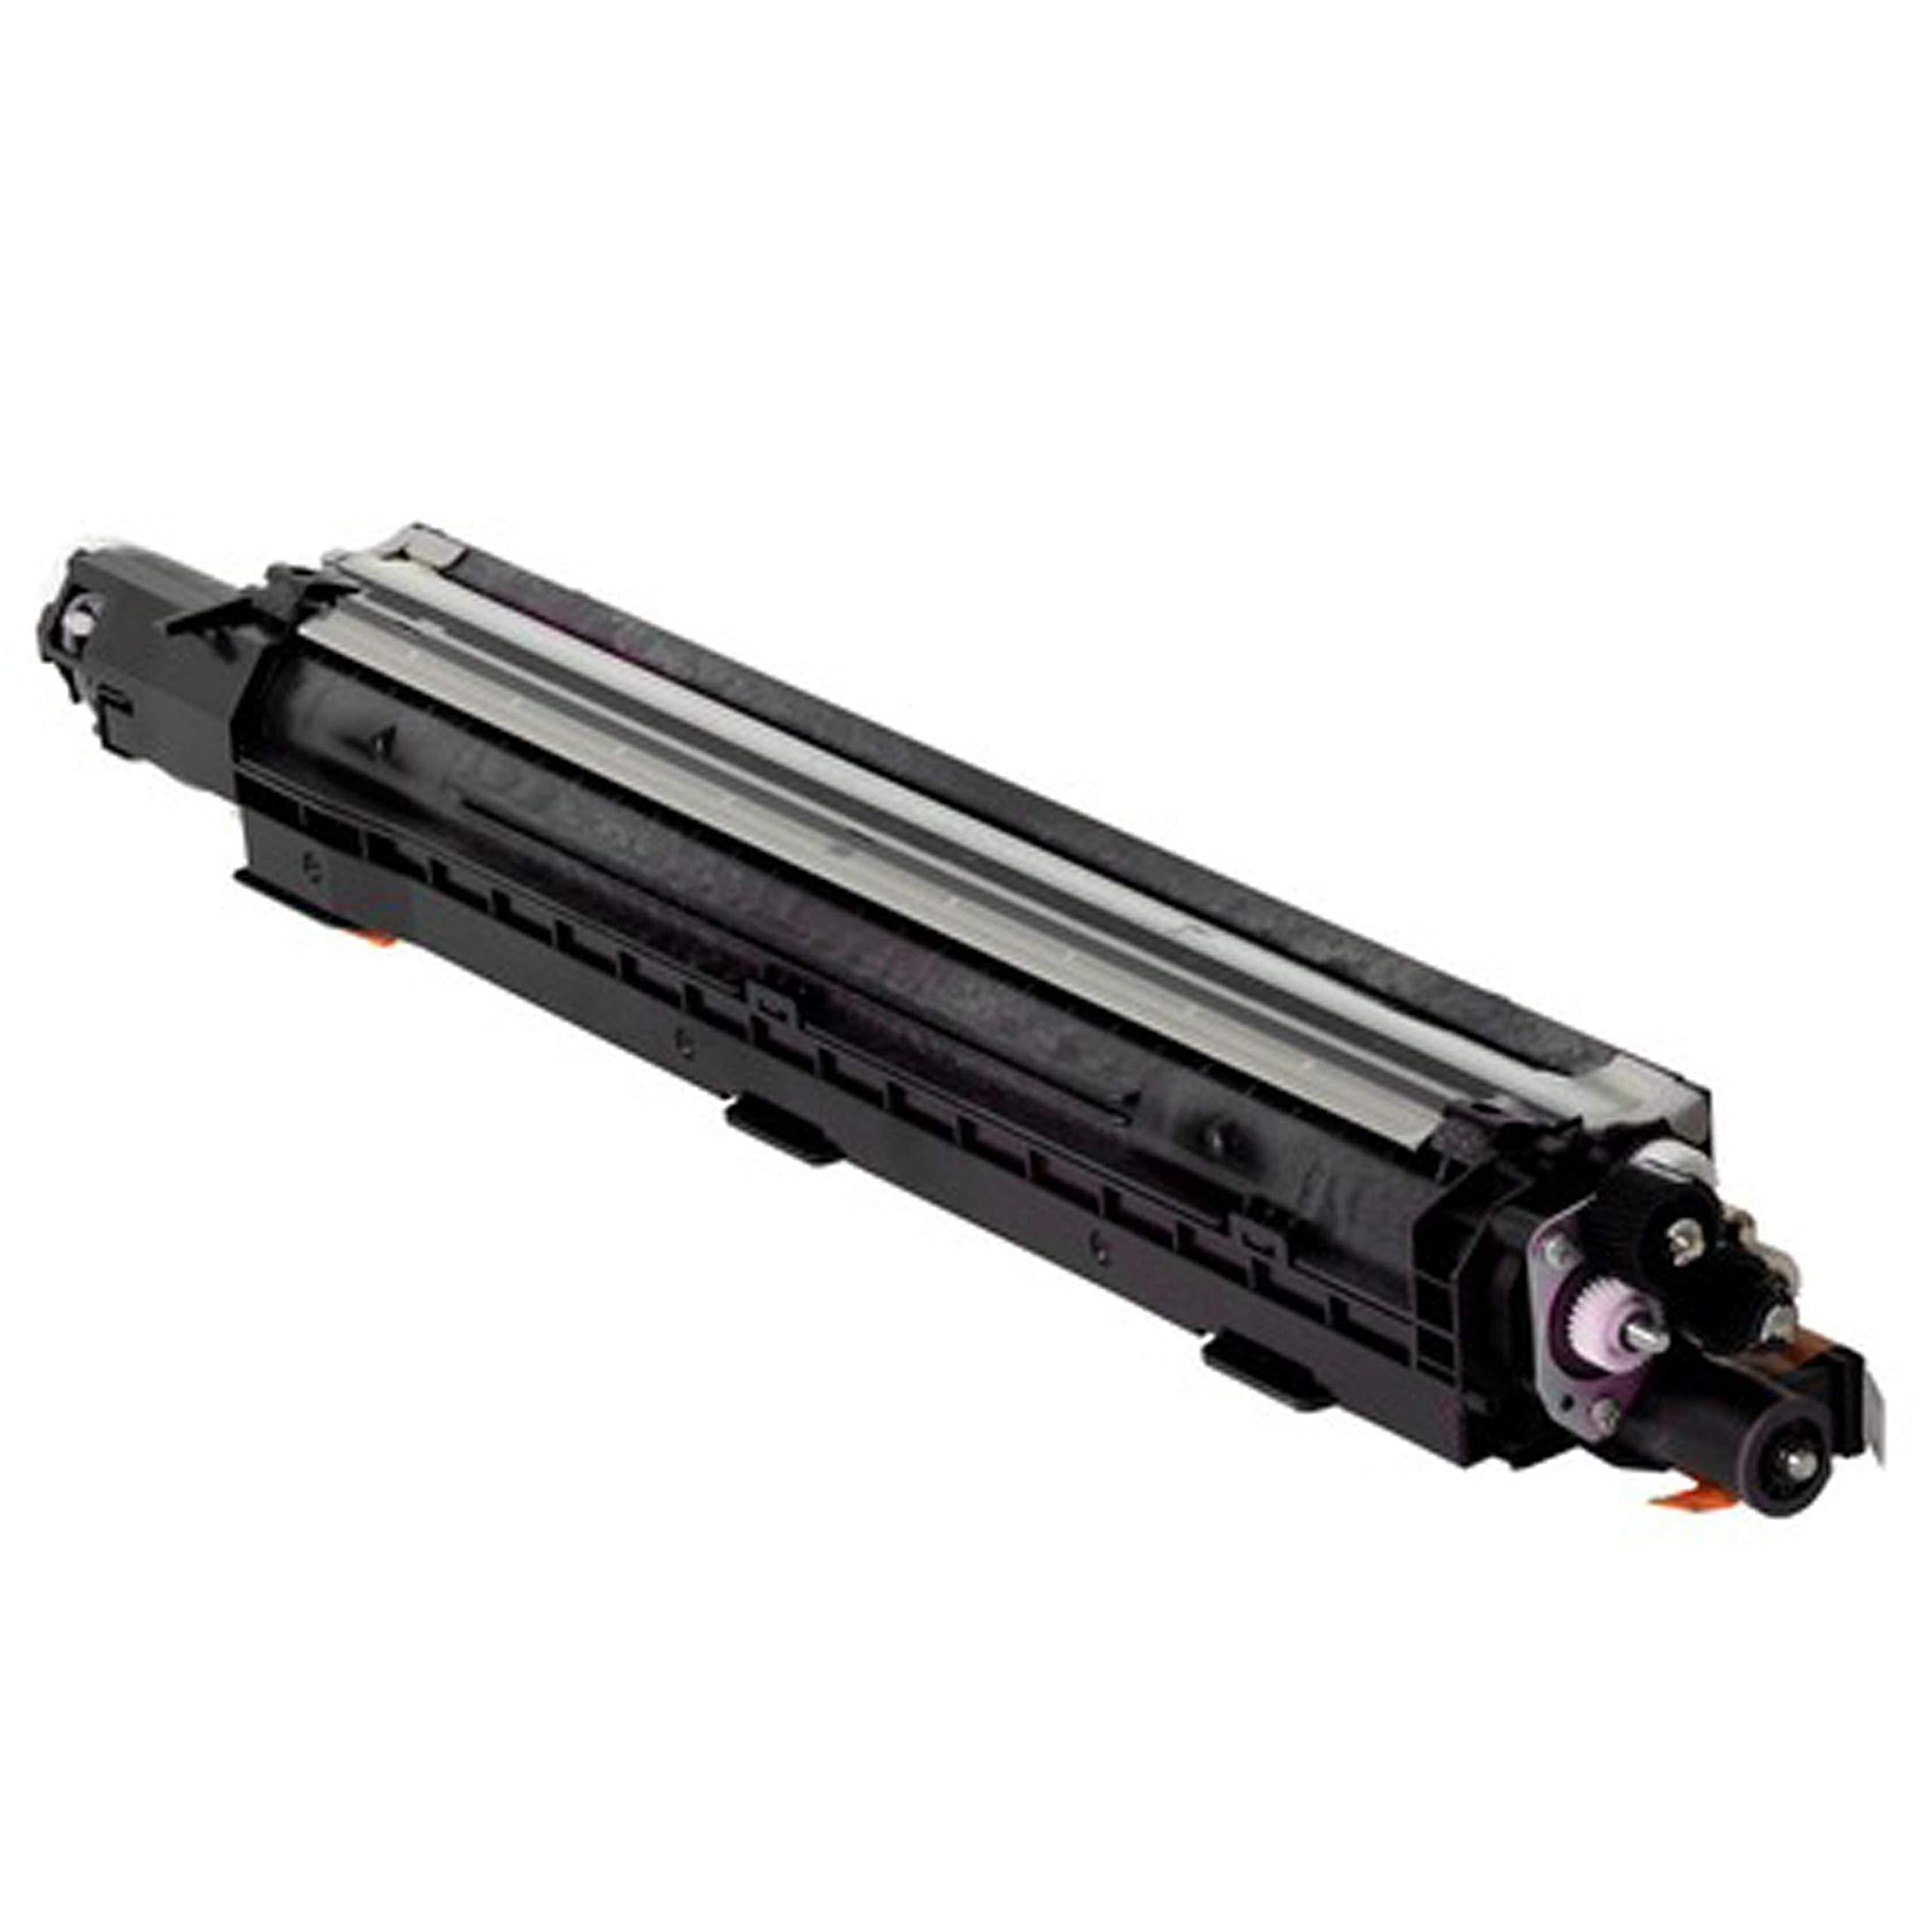 New OEM Magenta Developer Unit for Ricoh MP C6003 C5503 C4503 C3503 C3003 Part # D186-3030